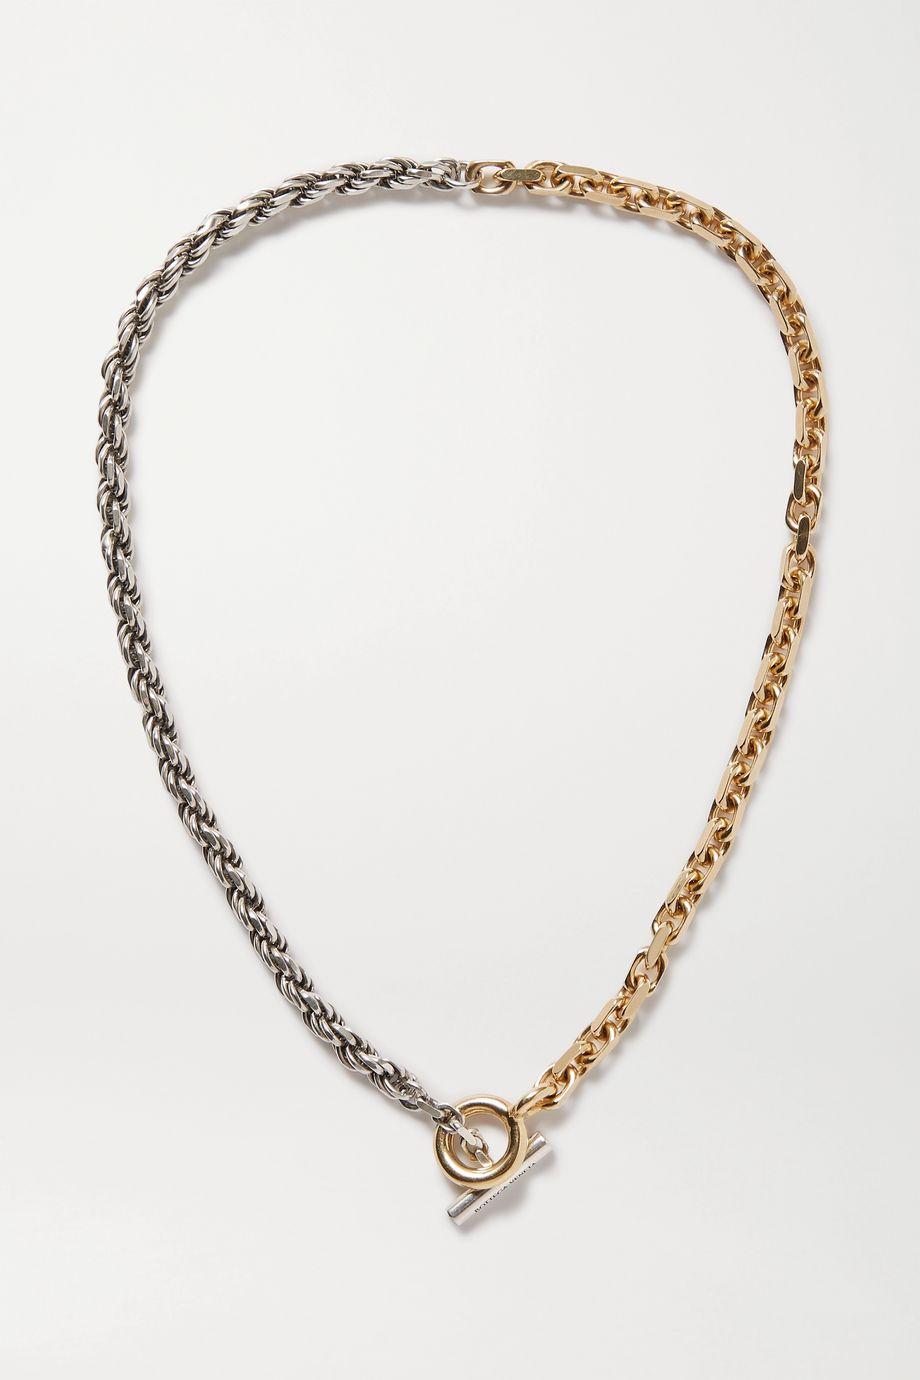 Bottega Veneta Gold and silver-tone necklace